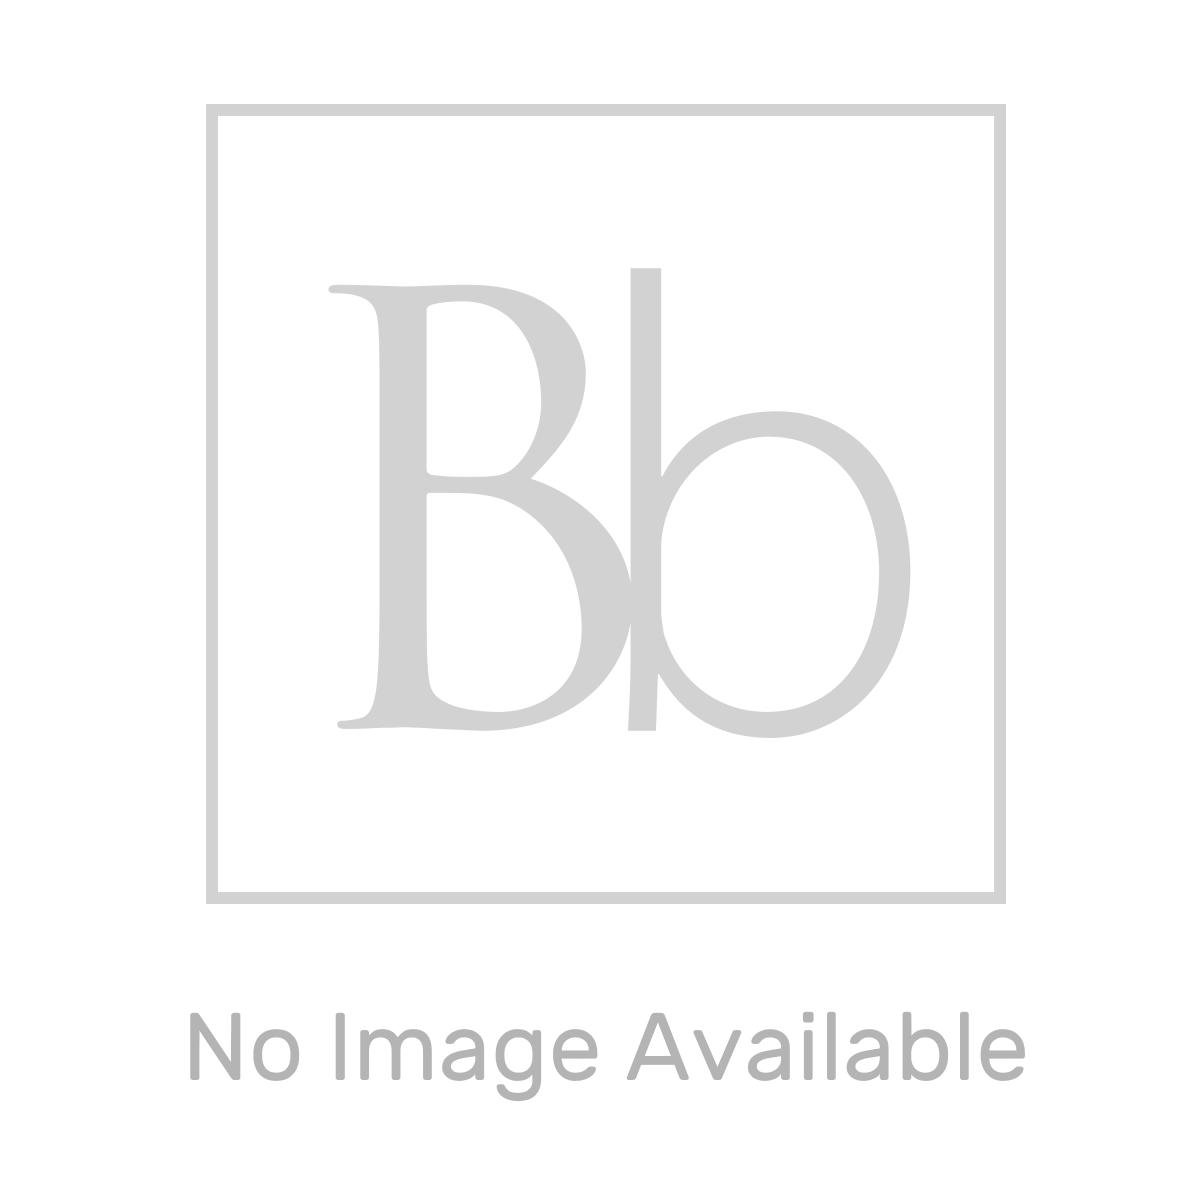 Aquadart Black Slate Shower Tray 1200 x 800 Lifestyle